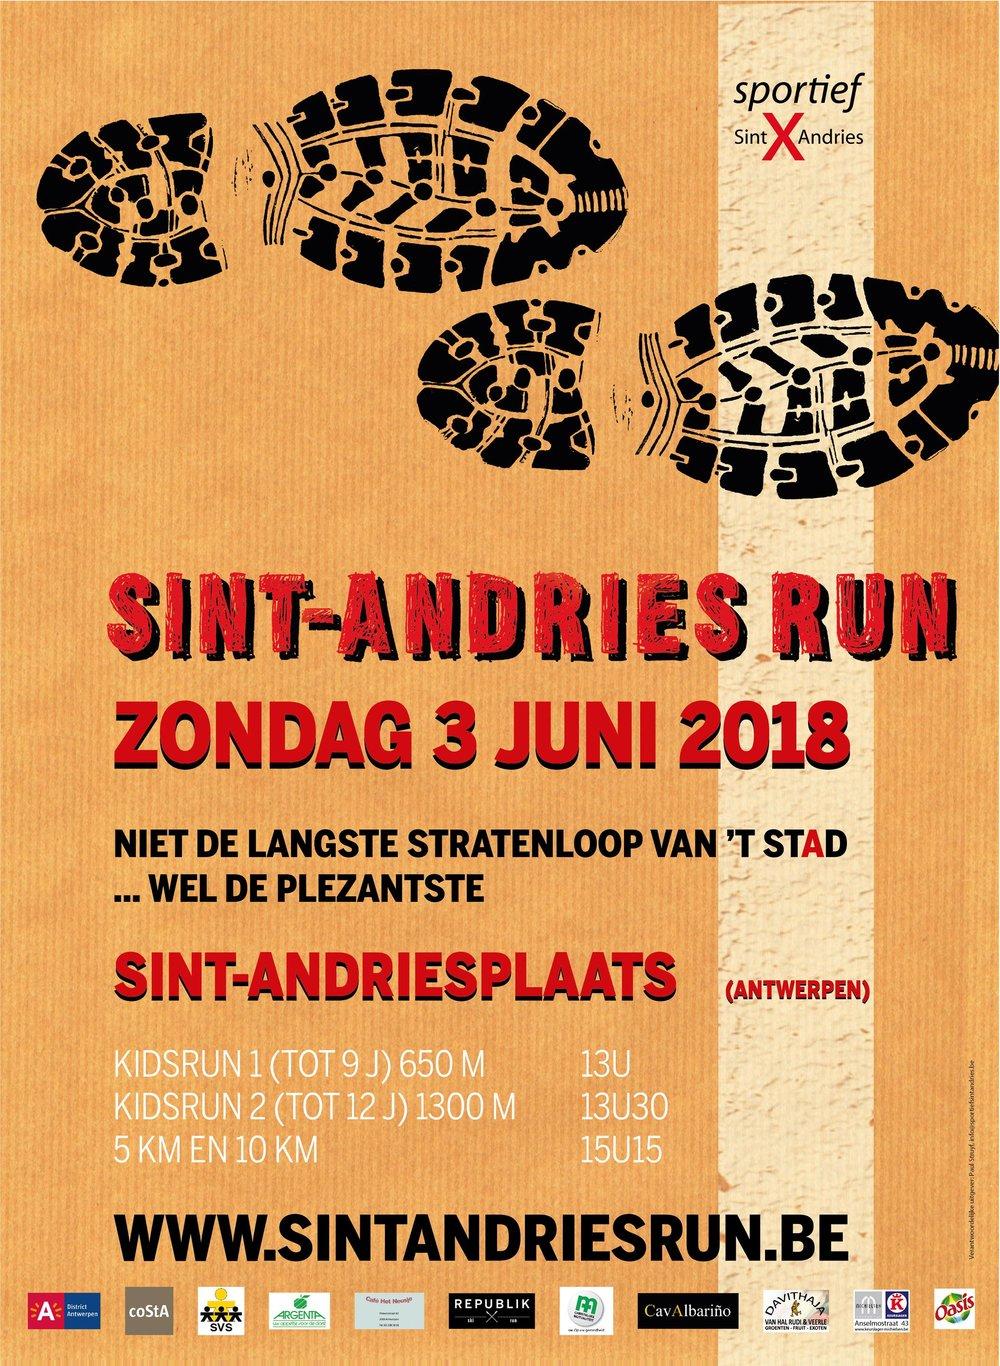 Sint-Andries Run 2018.jpg